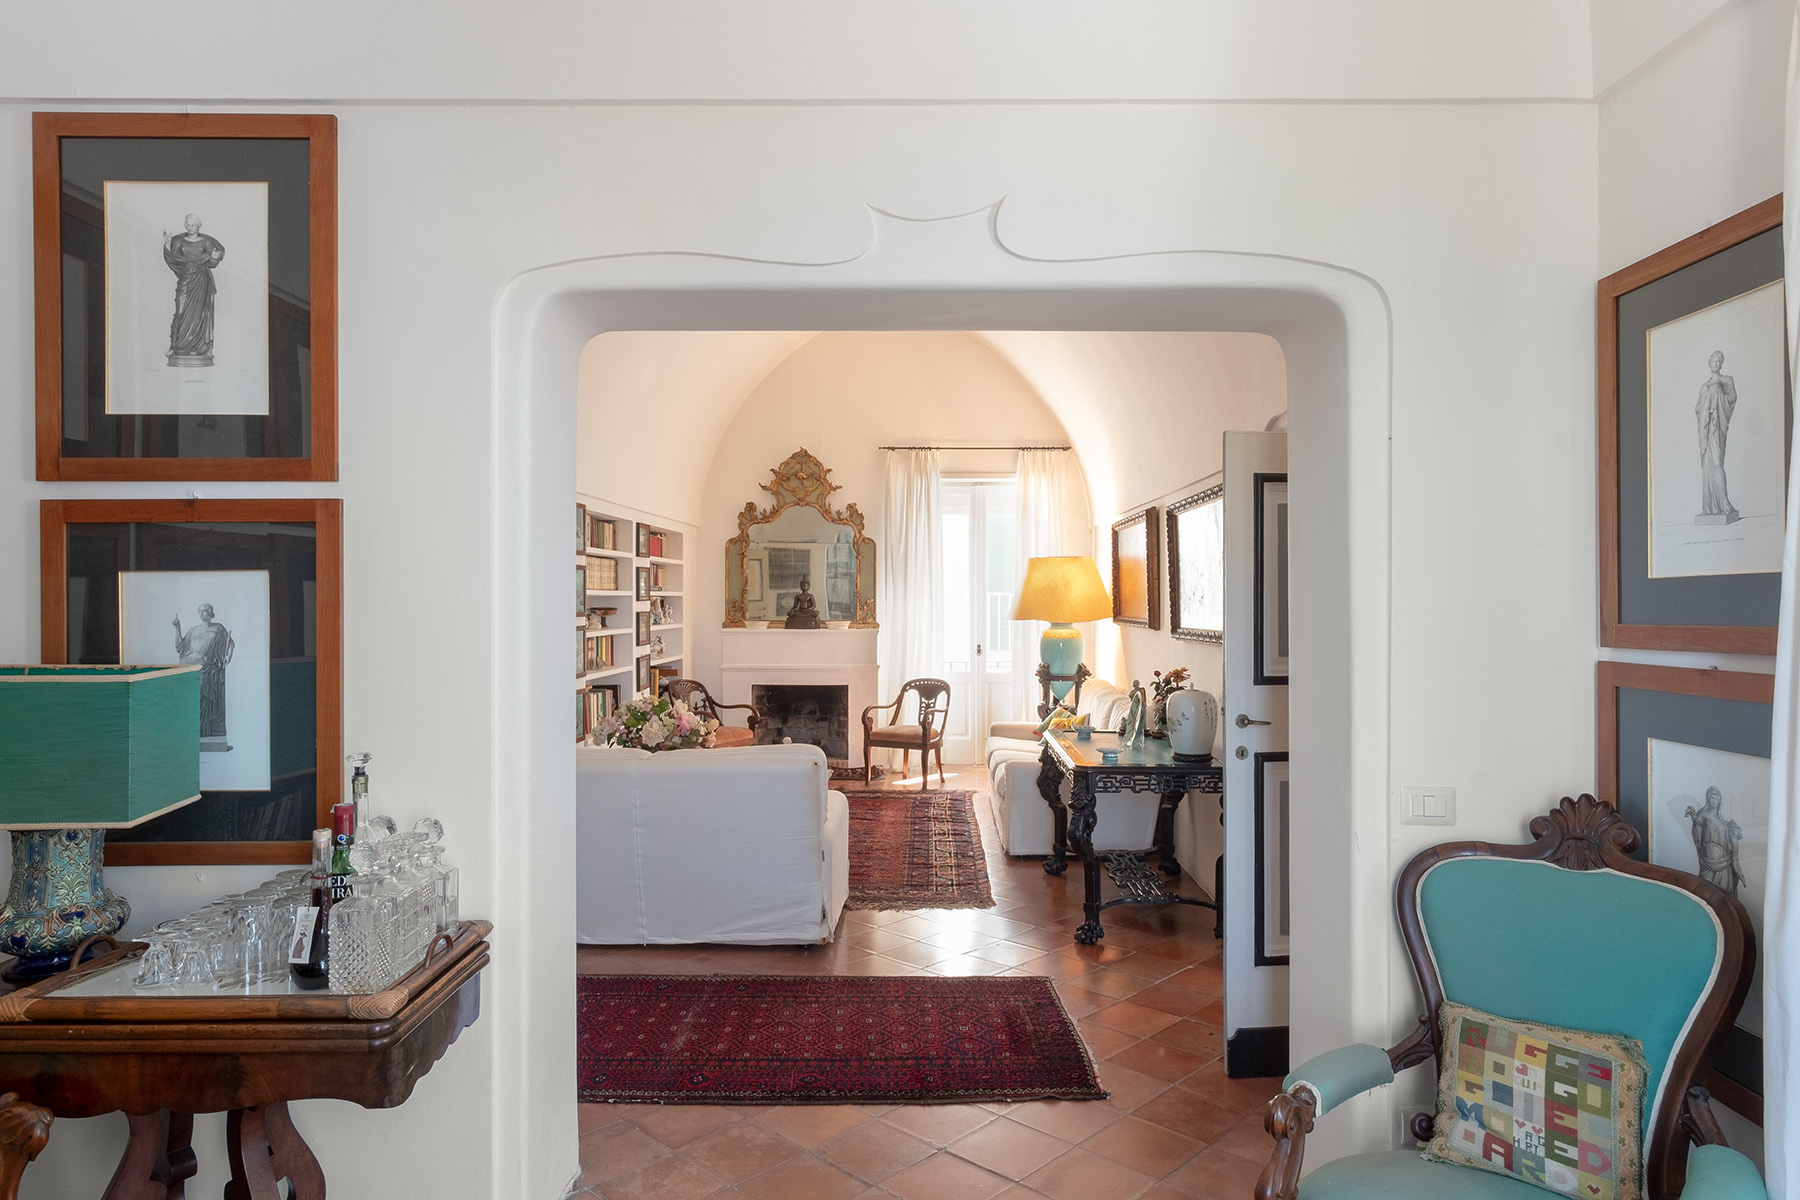 Casa indipendente in Vendita a Capri: 5 locali, 300 mq - Foto 13